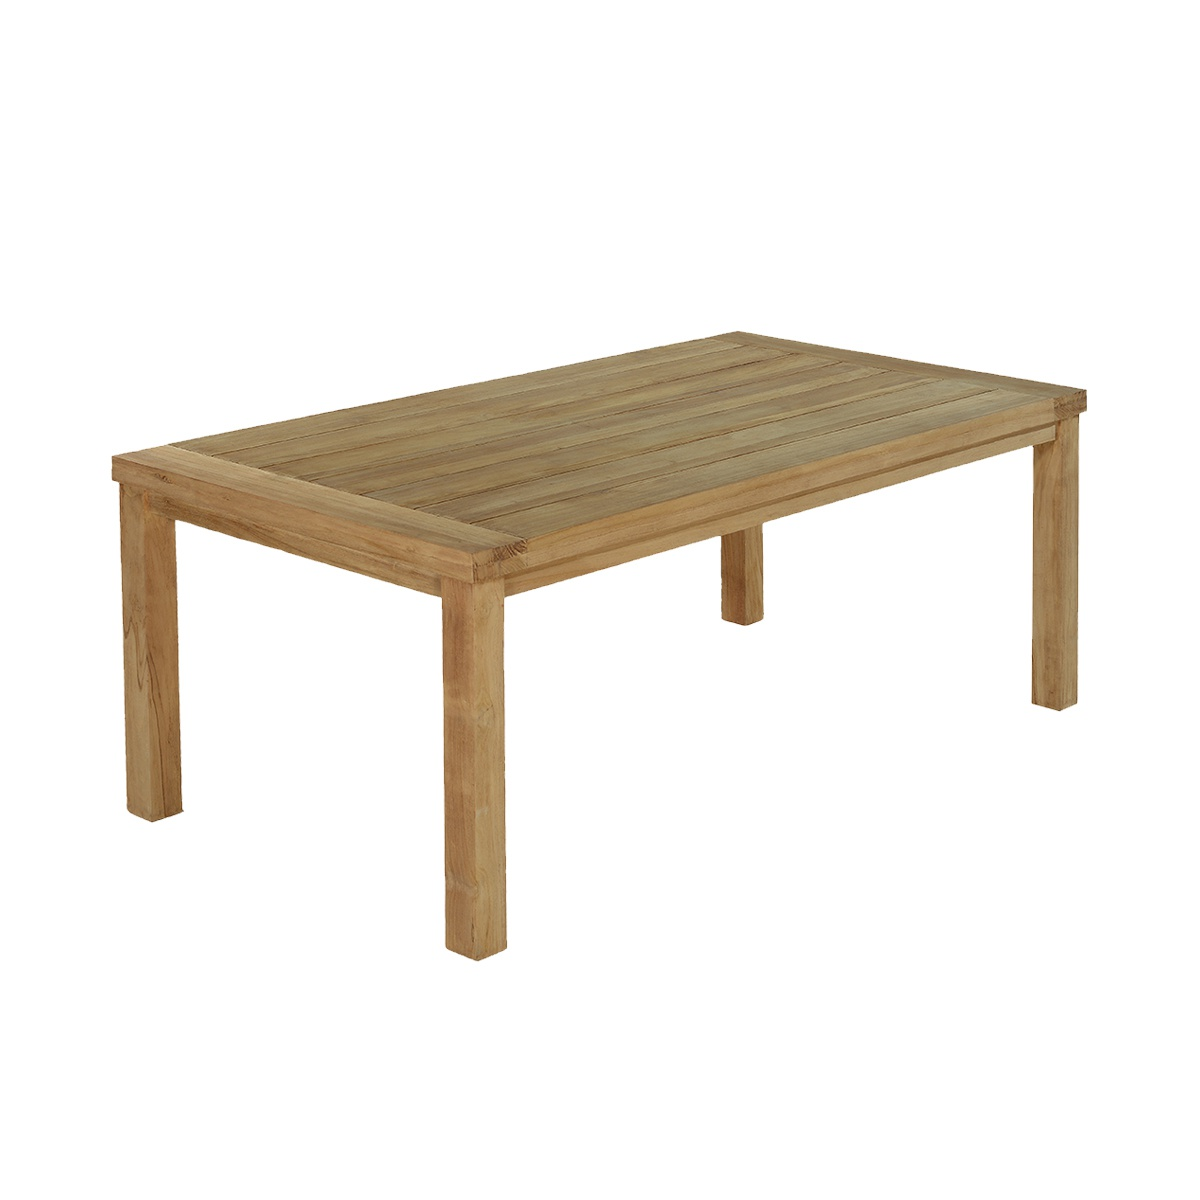 Table de jardin en teck massif L250